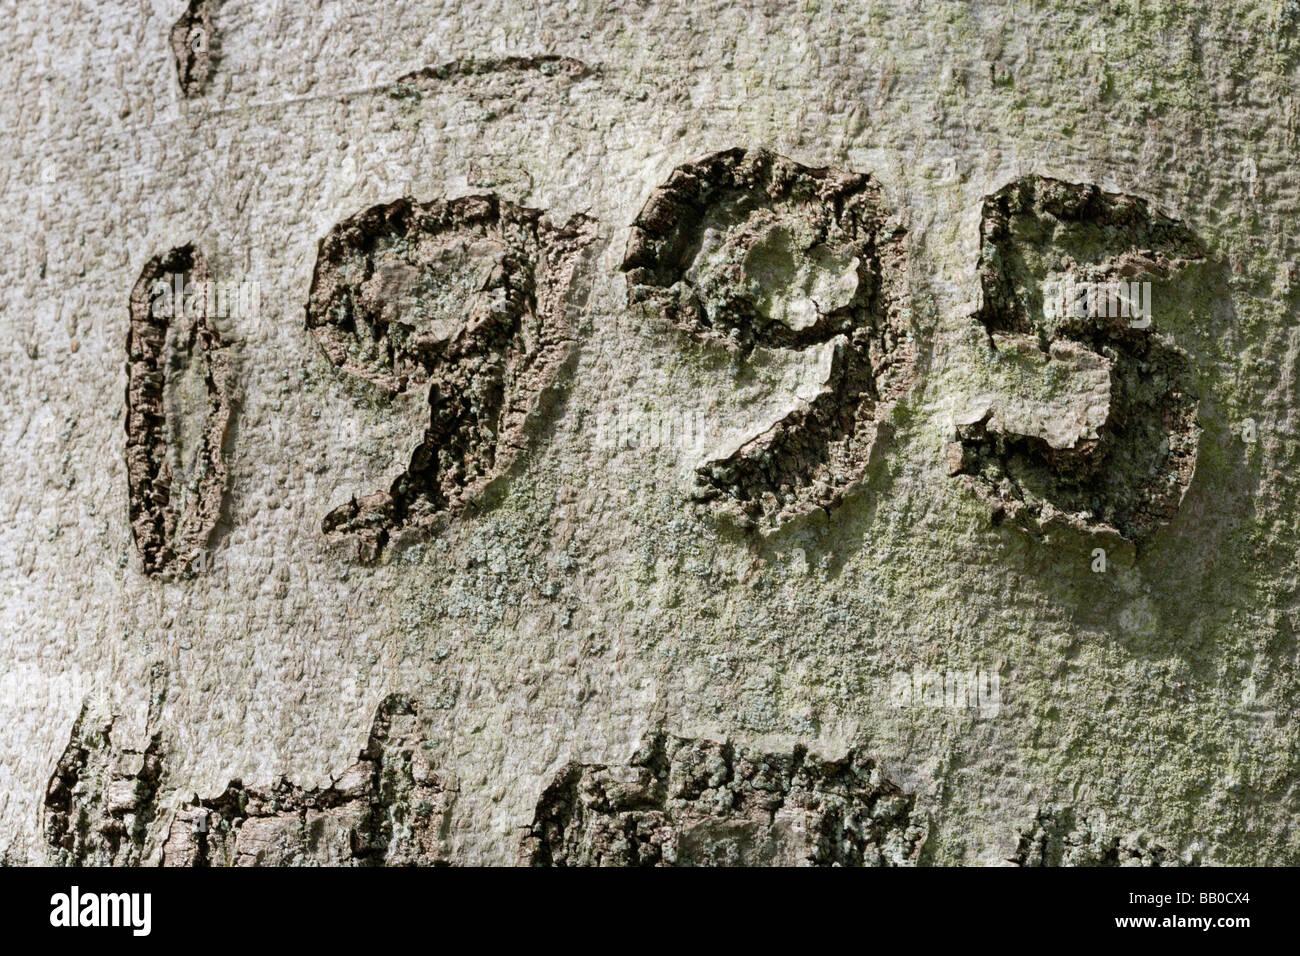 1995 date scored into beech tree trunk bark - Stock Image